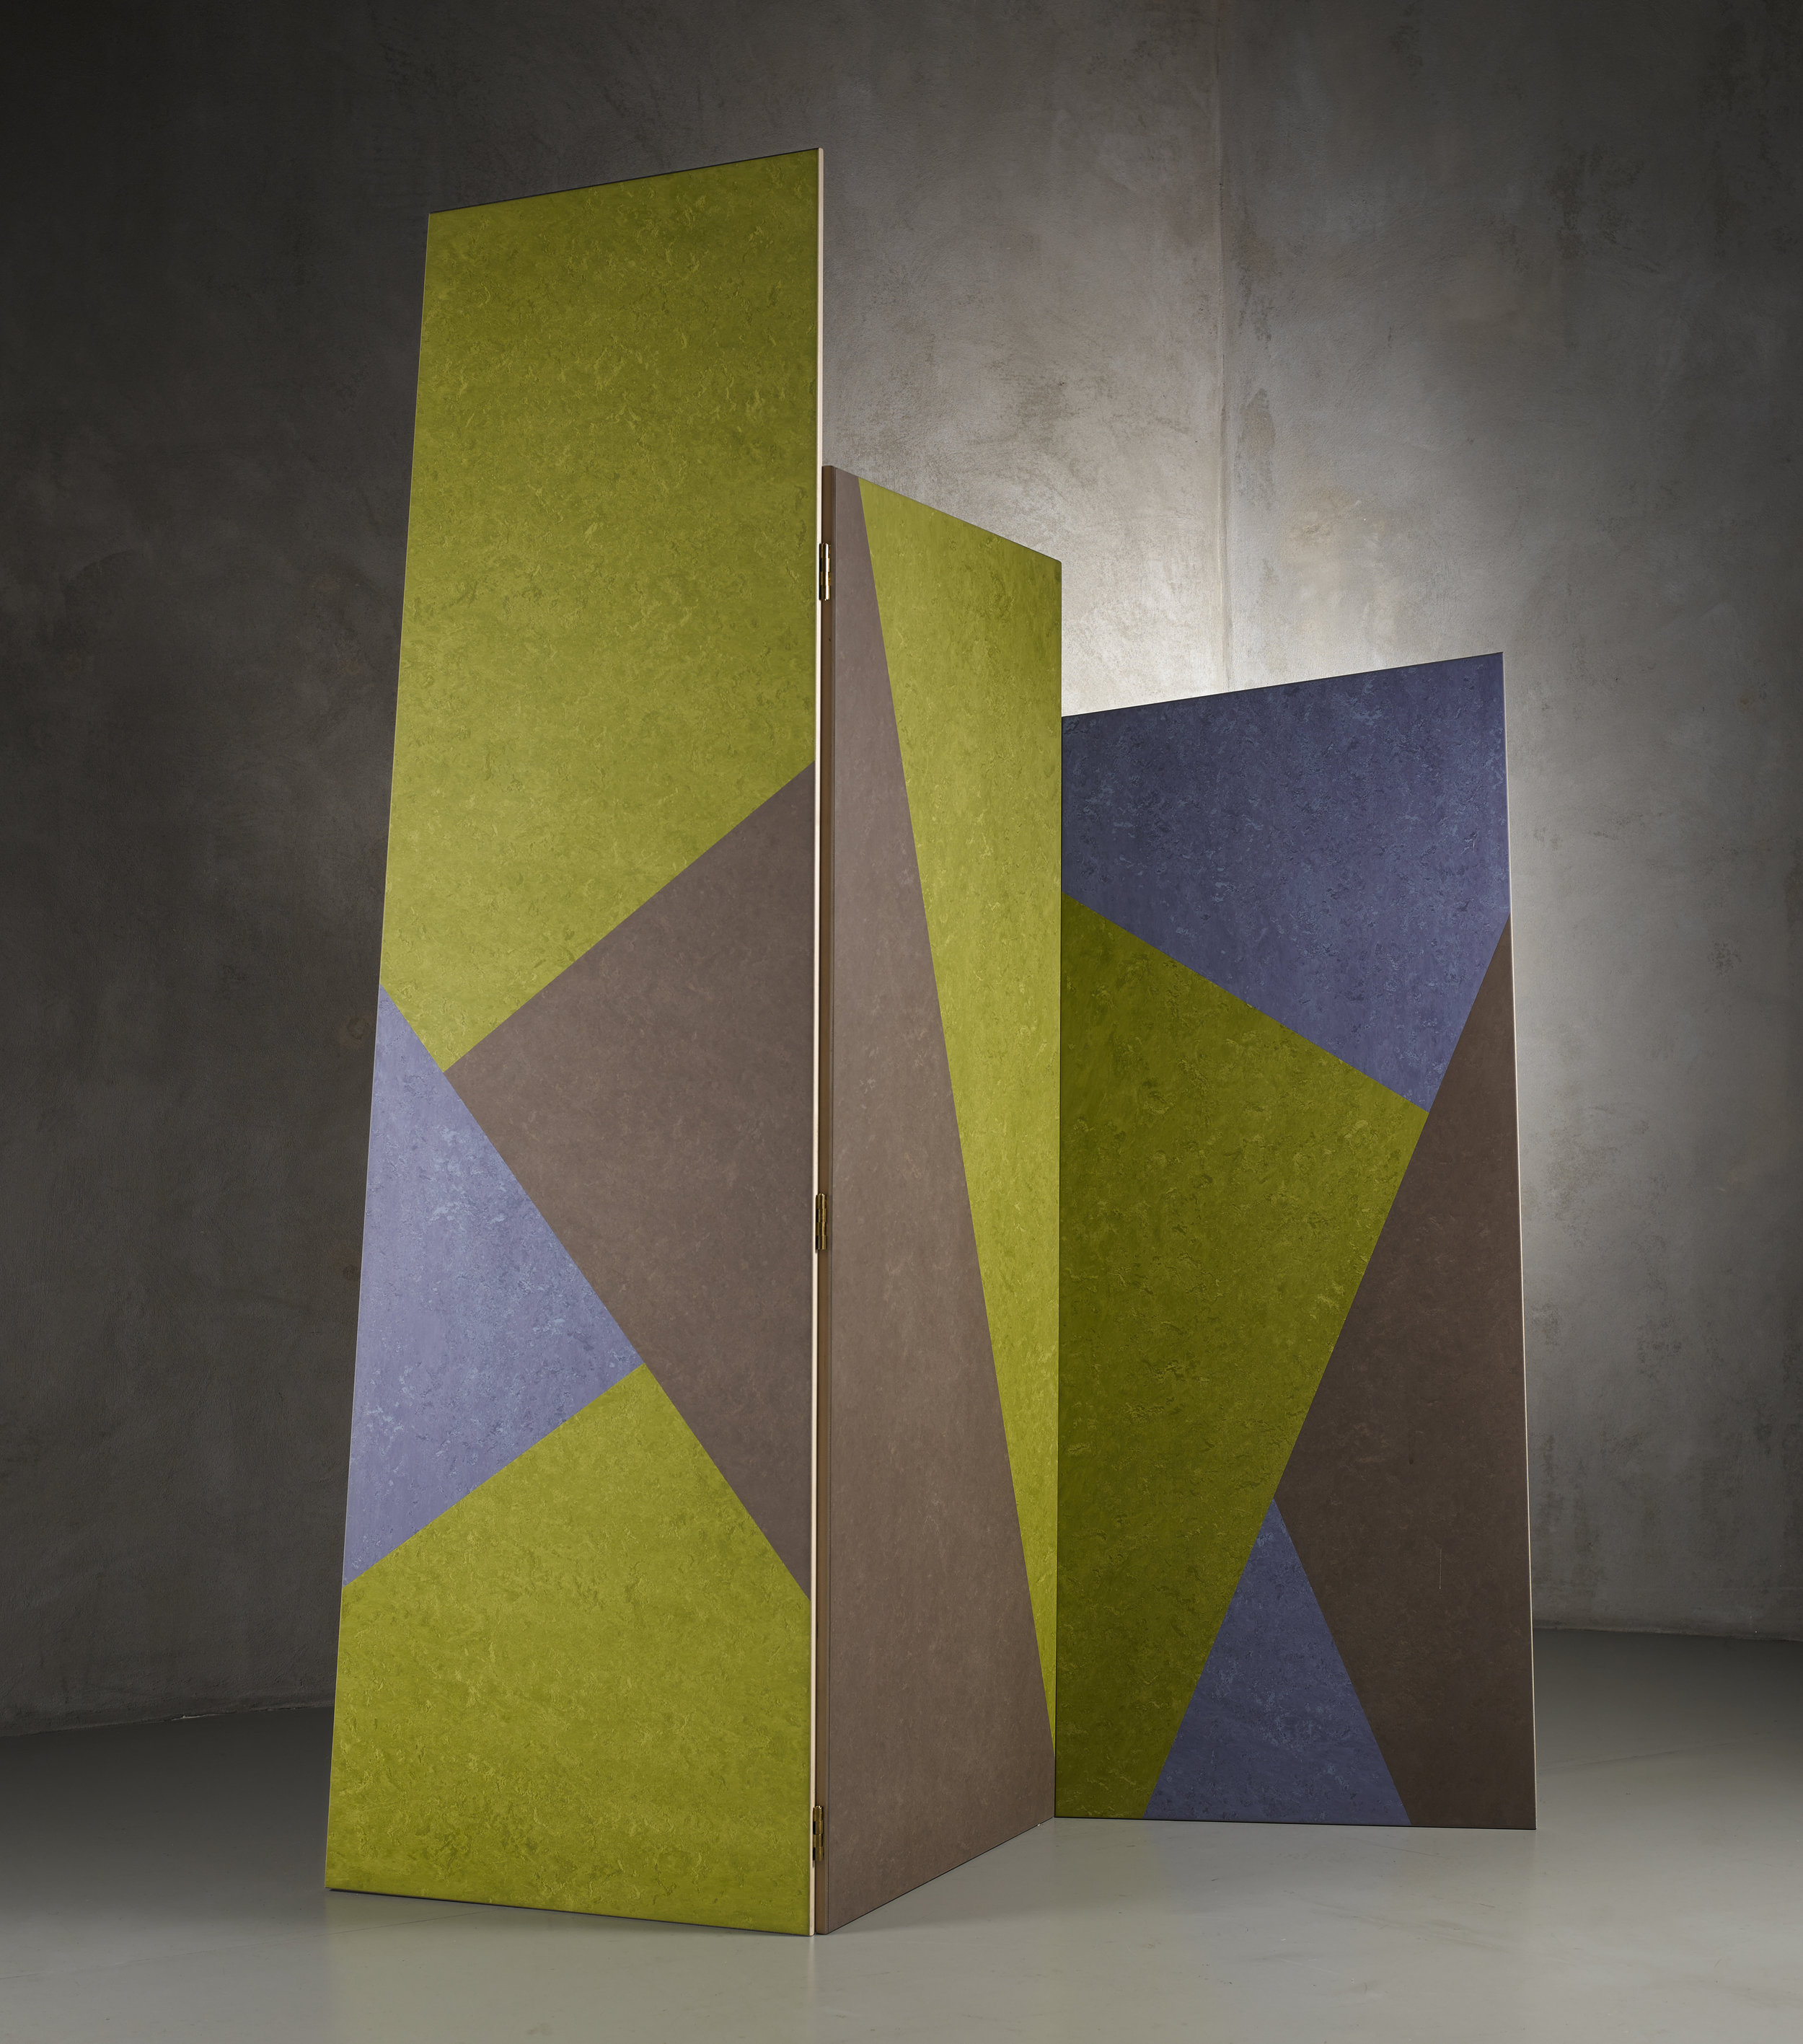 Pair of Paraventissimo 01 e 02 screens, UK, 2014, on display at Nilufar stand, Design Miam/ Basel 2018  Design: Martino Gamper Plywood, lino heat treated oak, maple; Custom colours and dimension  ⓒ Nilufar Gallery